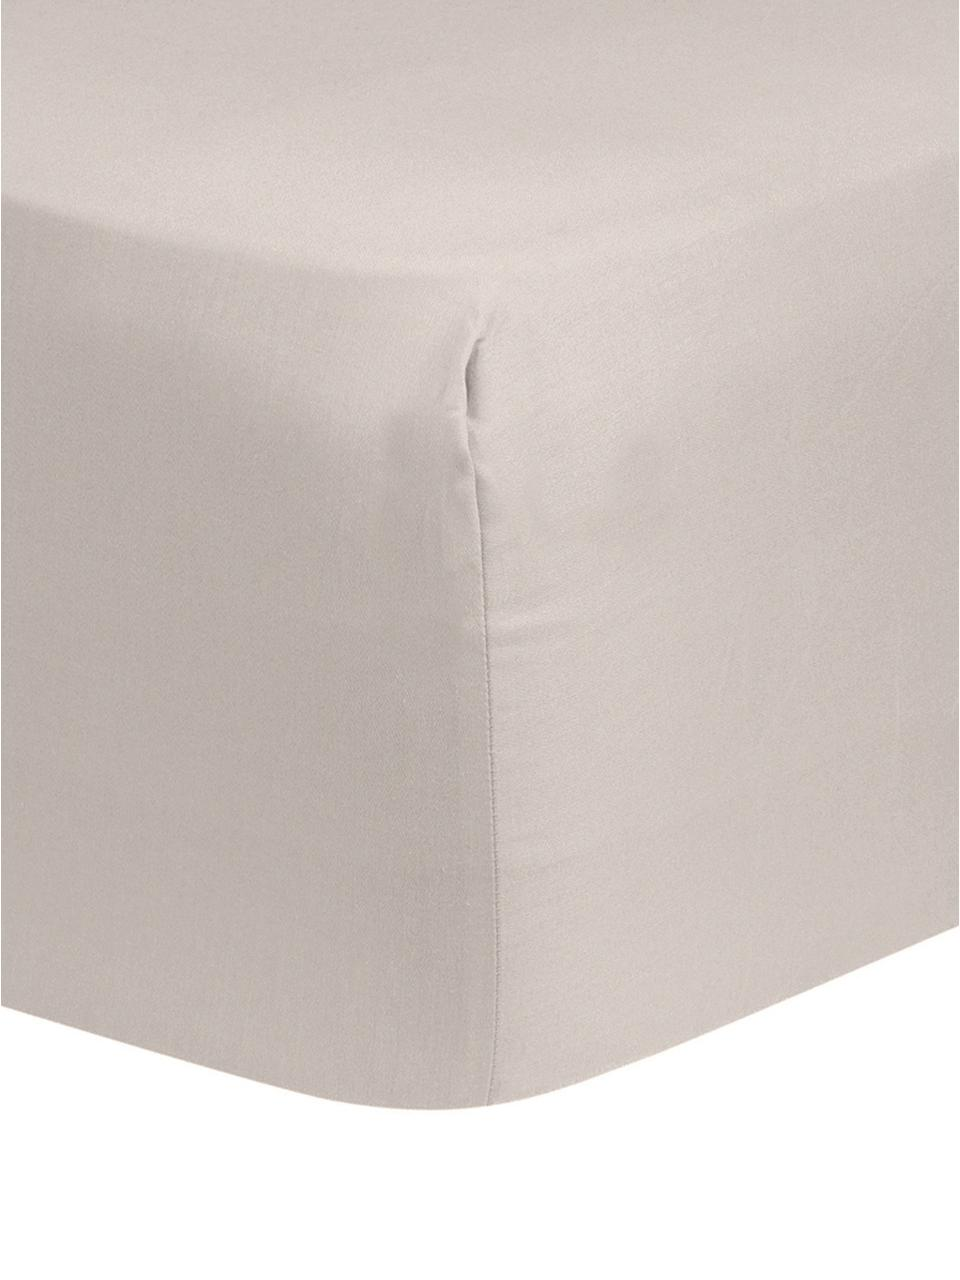 Lenzuolo con angoli in raso di cotone color taupe Comfort, Taupe, Larg. 200 x Lung. 200 cm